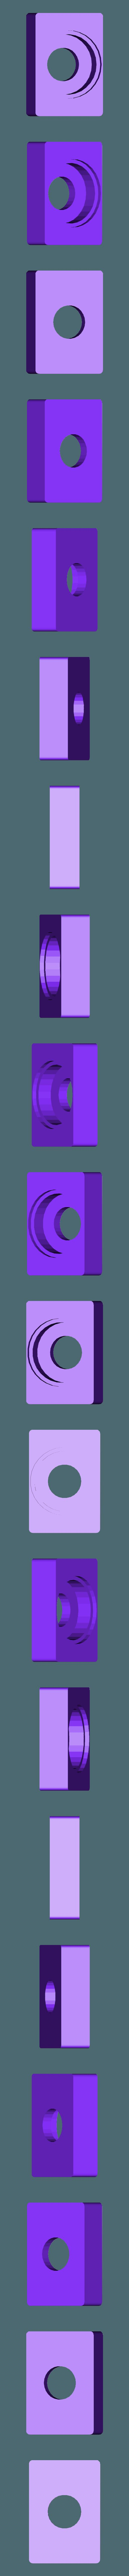 Pieza_Movil_con_rodamiento_parte_superior_husillo_eje_Z.stl Télécharger fichier STL gratuit Parte Superior Husillo eje Z con muelle para perfil de aluminio 2040 • Plan imprimable en 3D, celtarra12